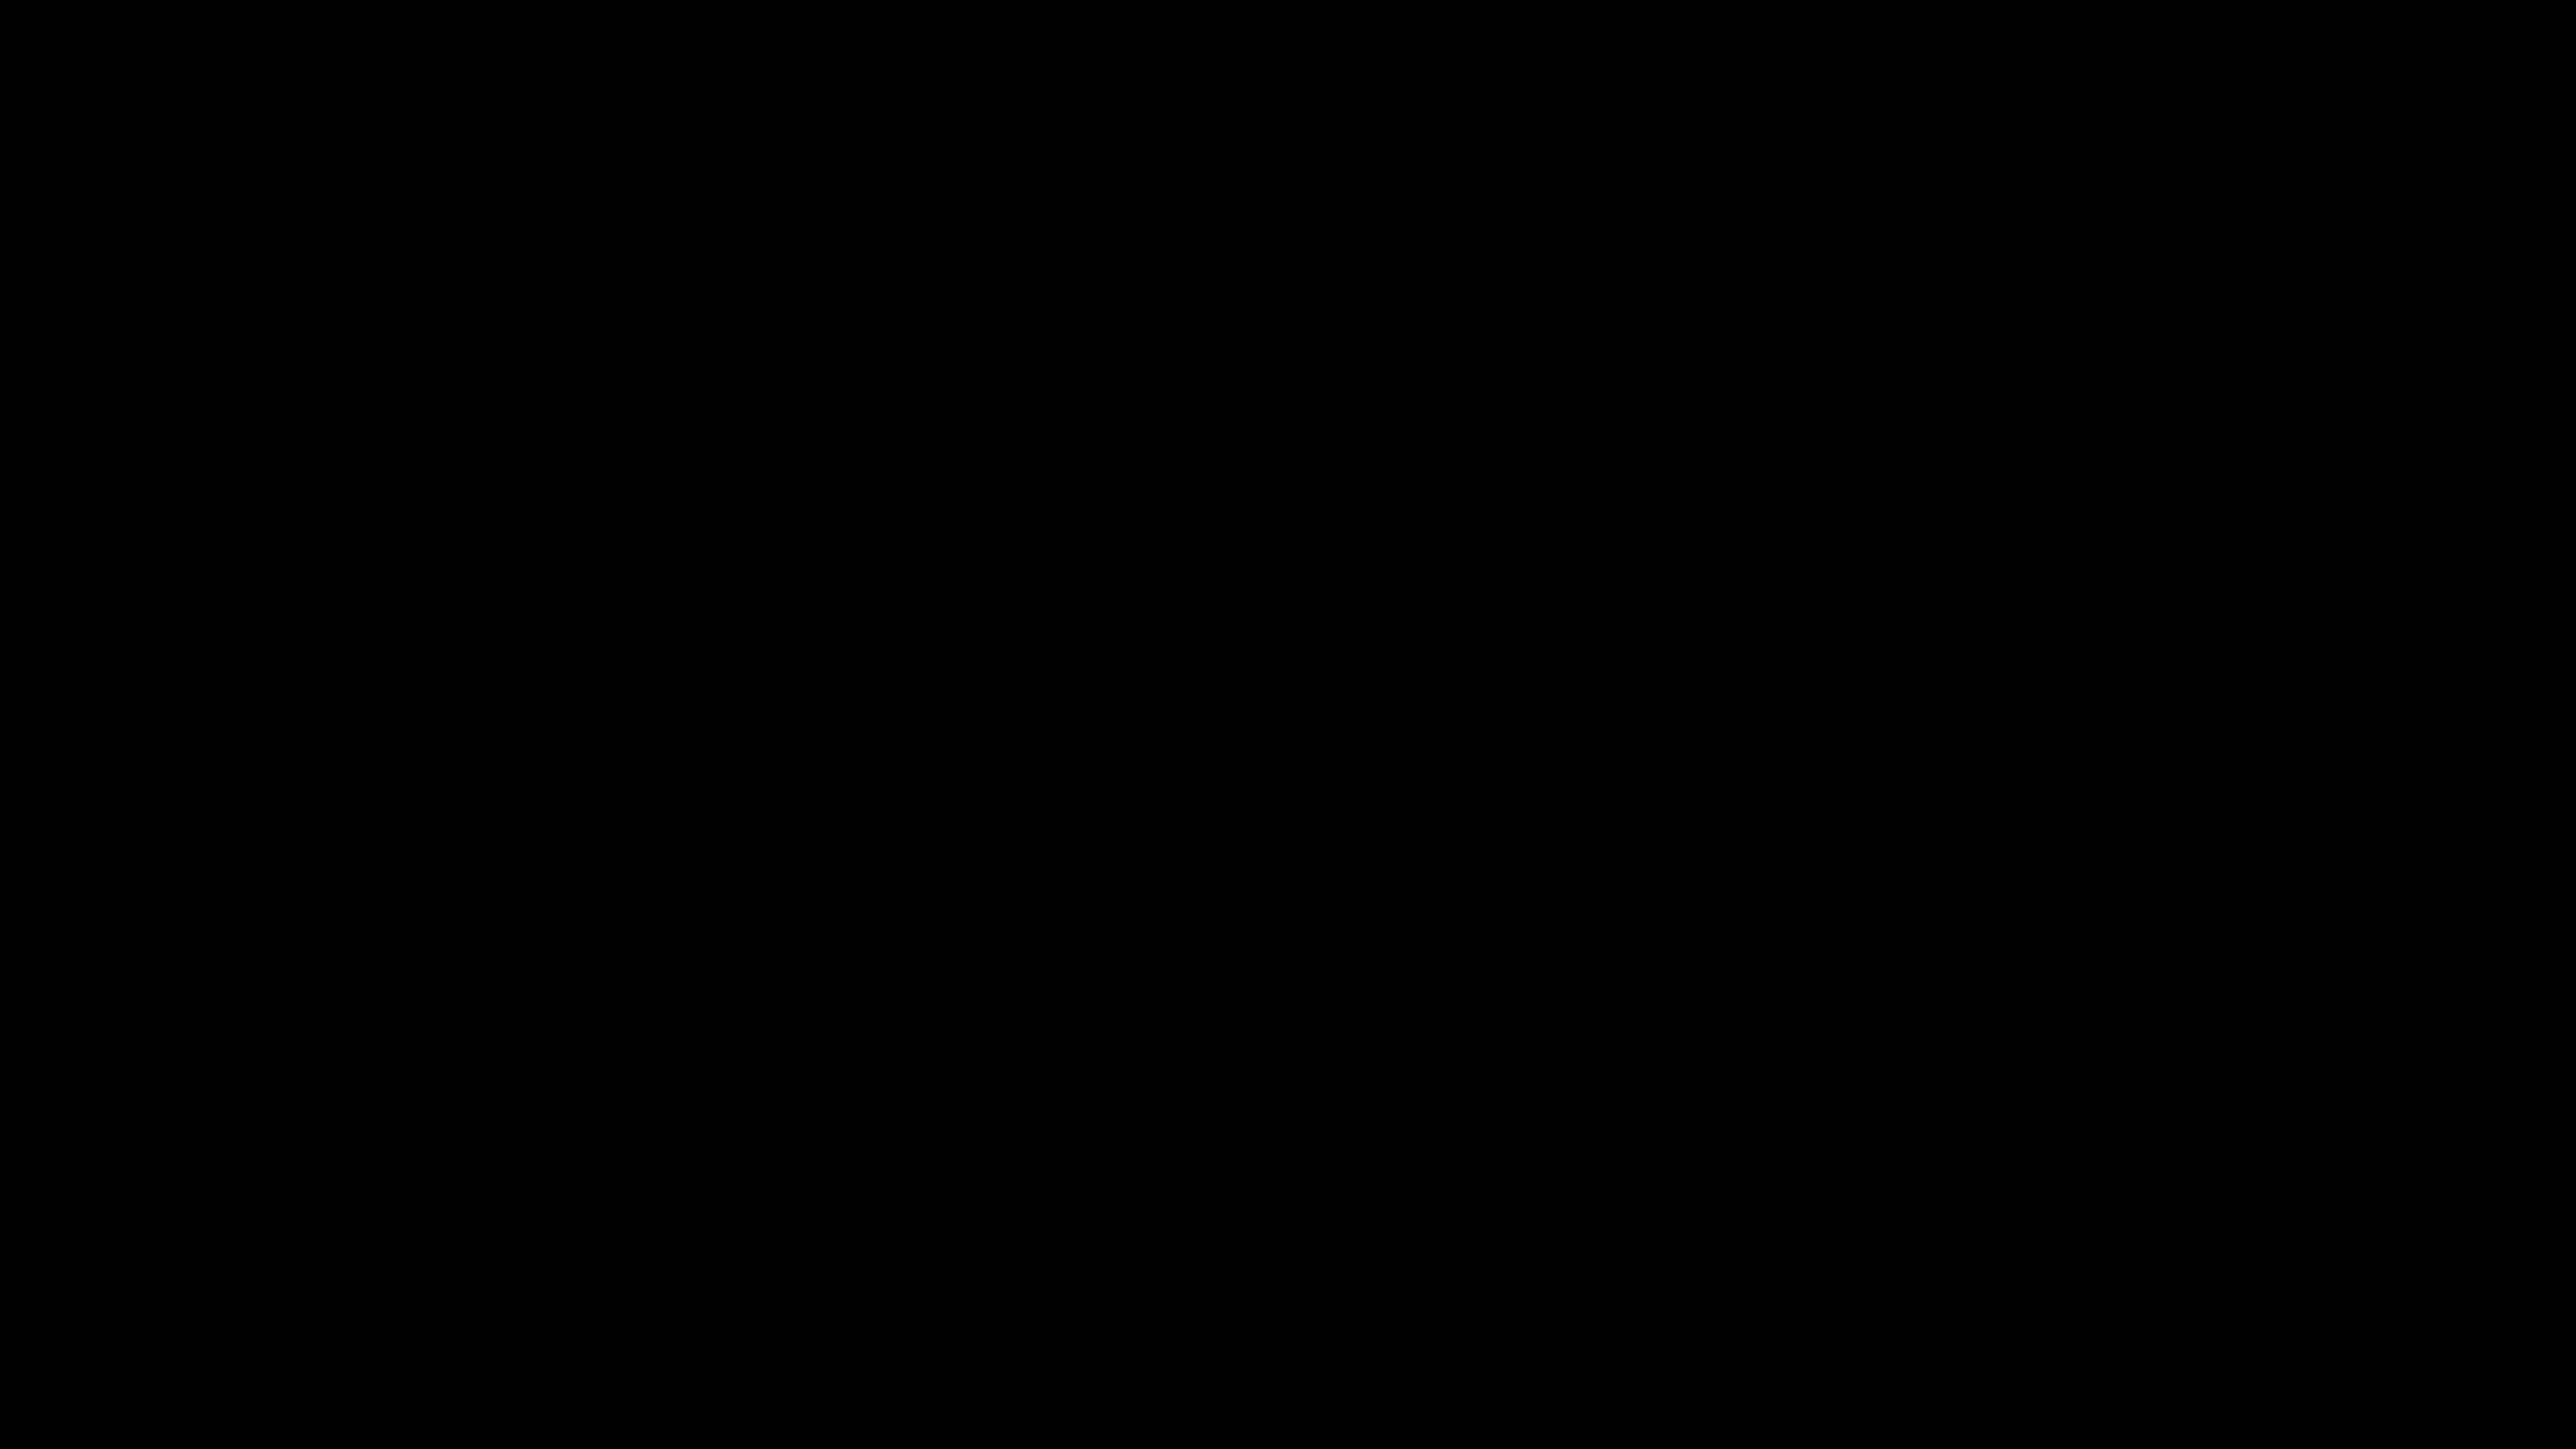 rad-leihen-ebike-testen-kln-bonn-nrw-trailacademy-bike-verleih-9